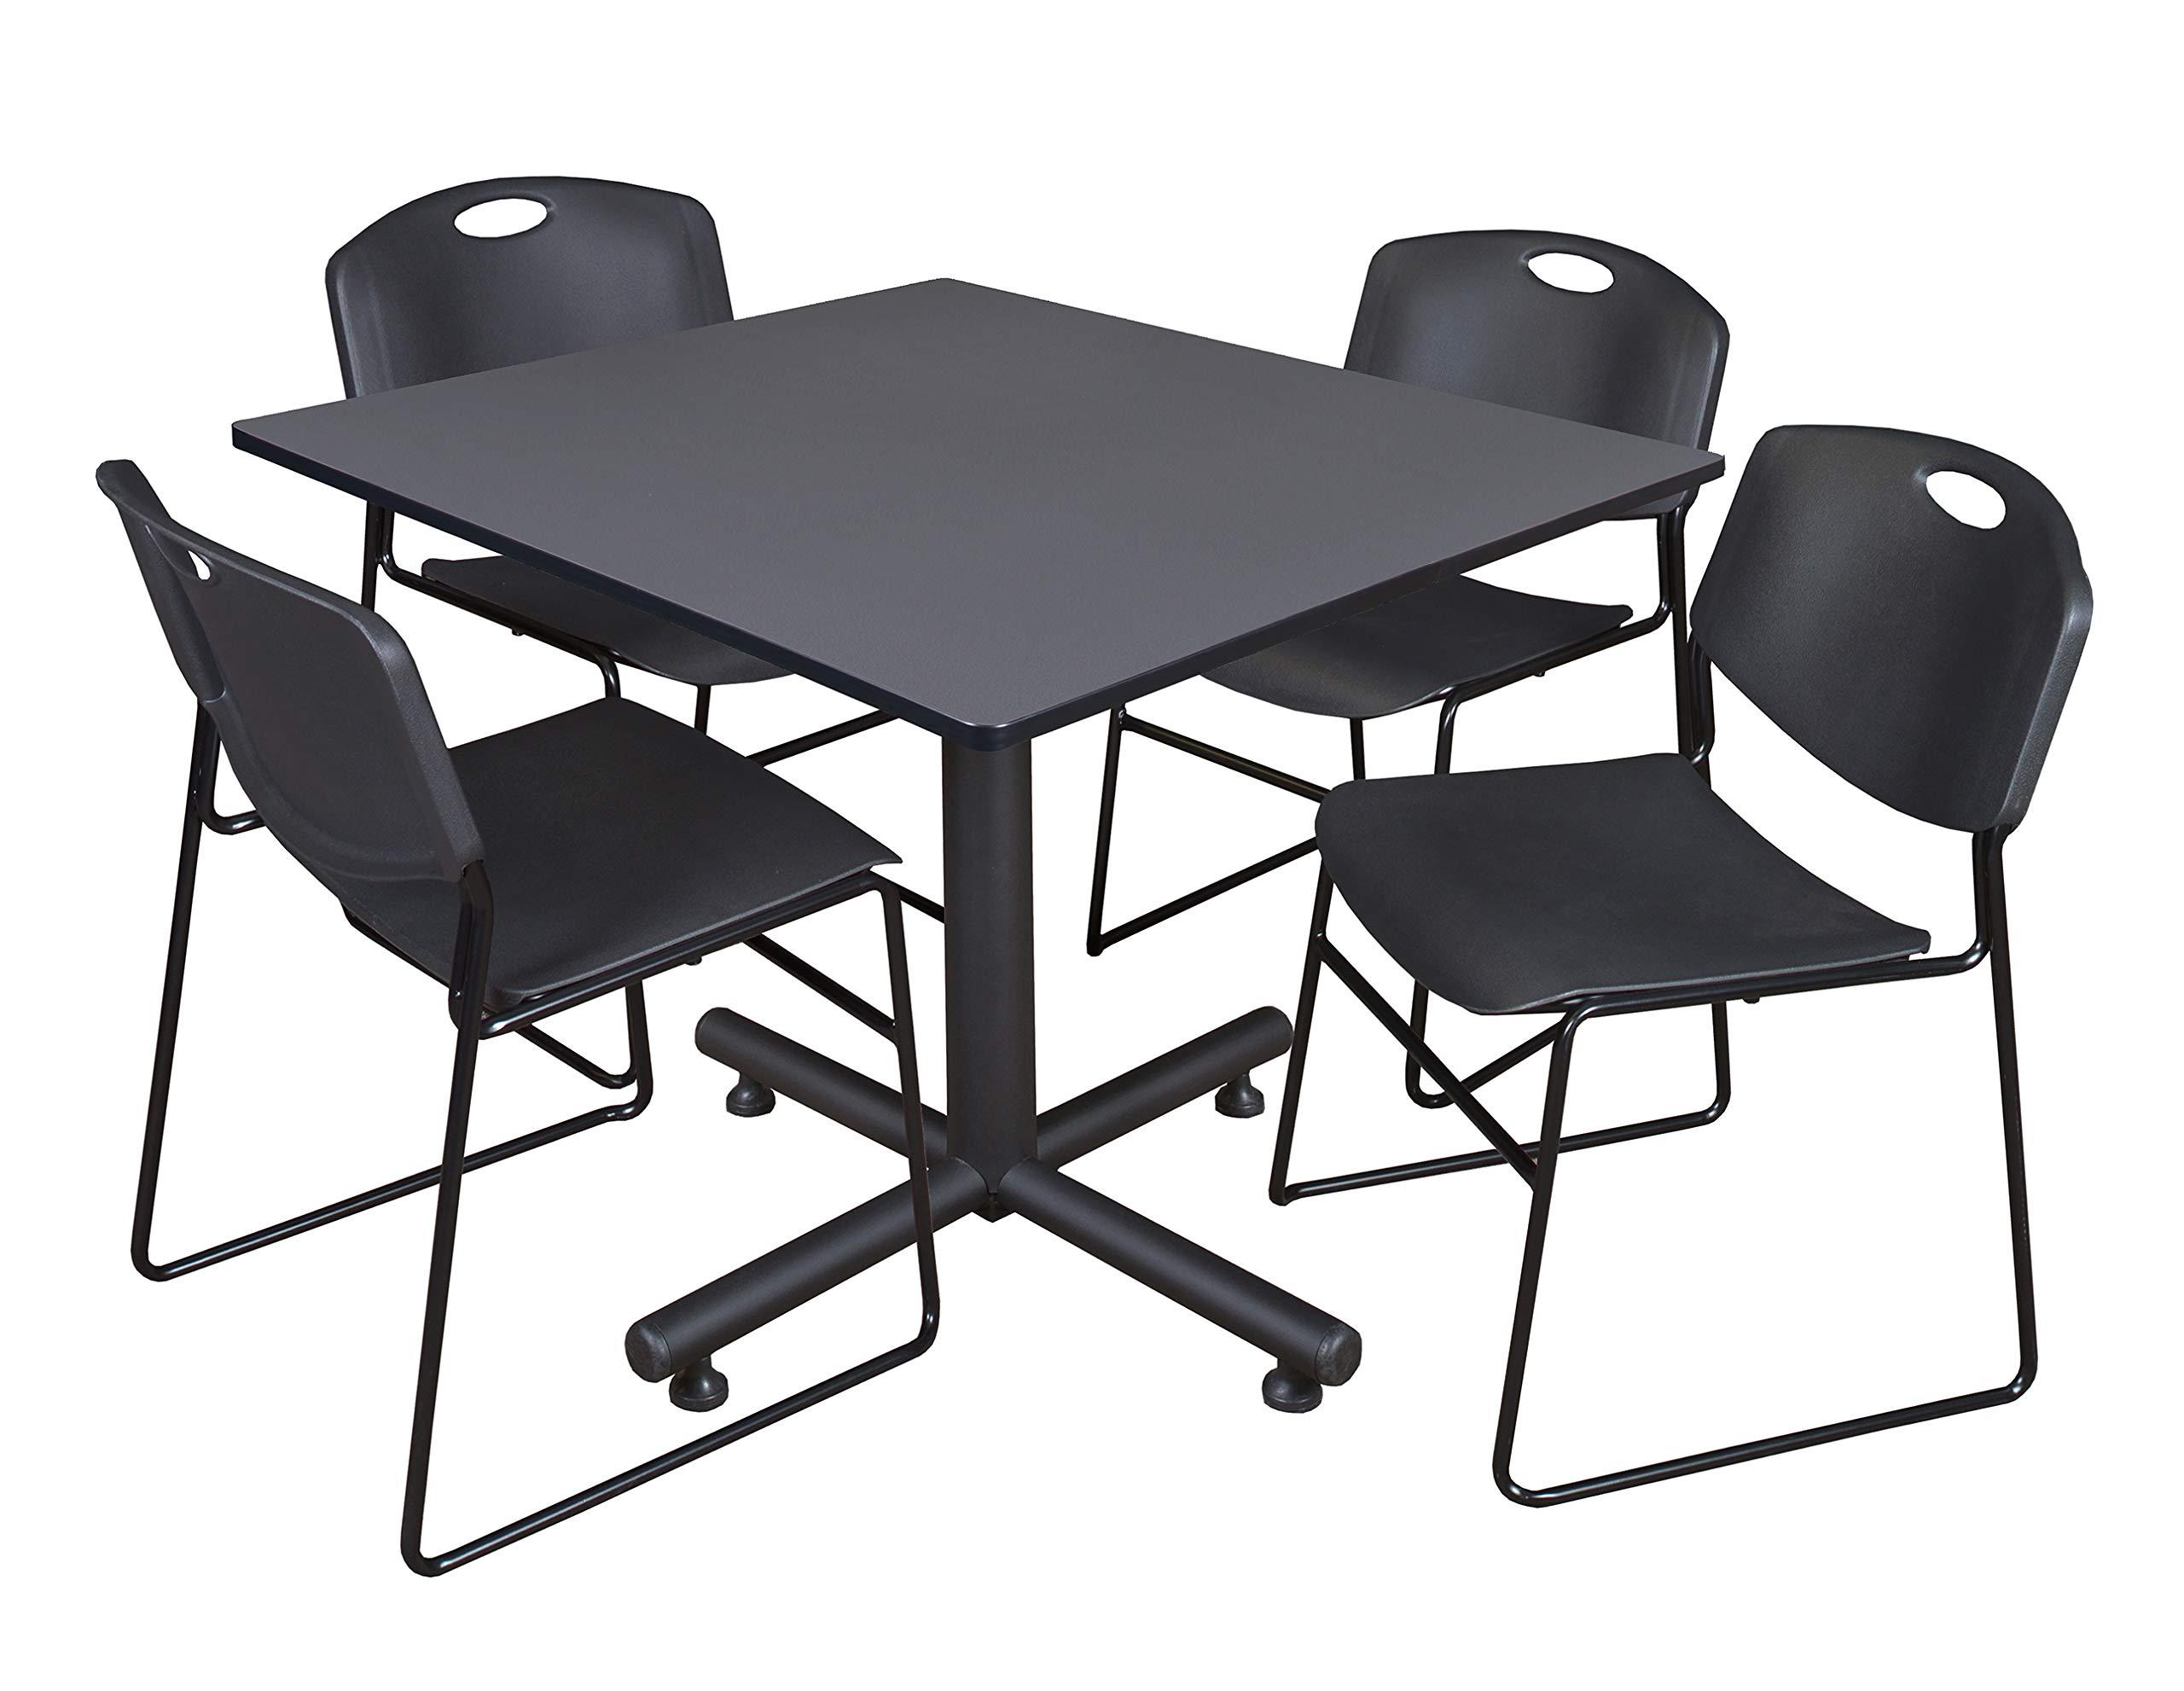 Regency Kobe 48-Inch Square Breakroom Table, Grey, and 4 Zeng Stack Chairs, Black by Regency Seating